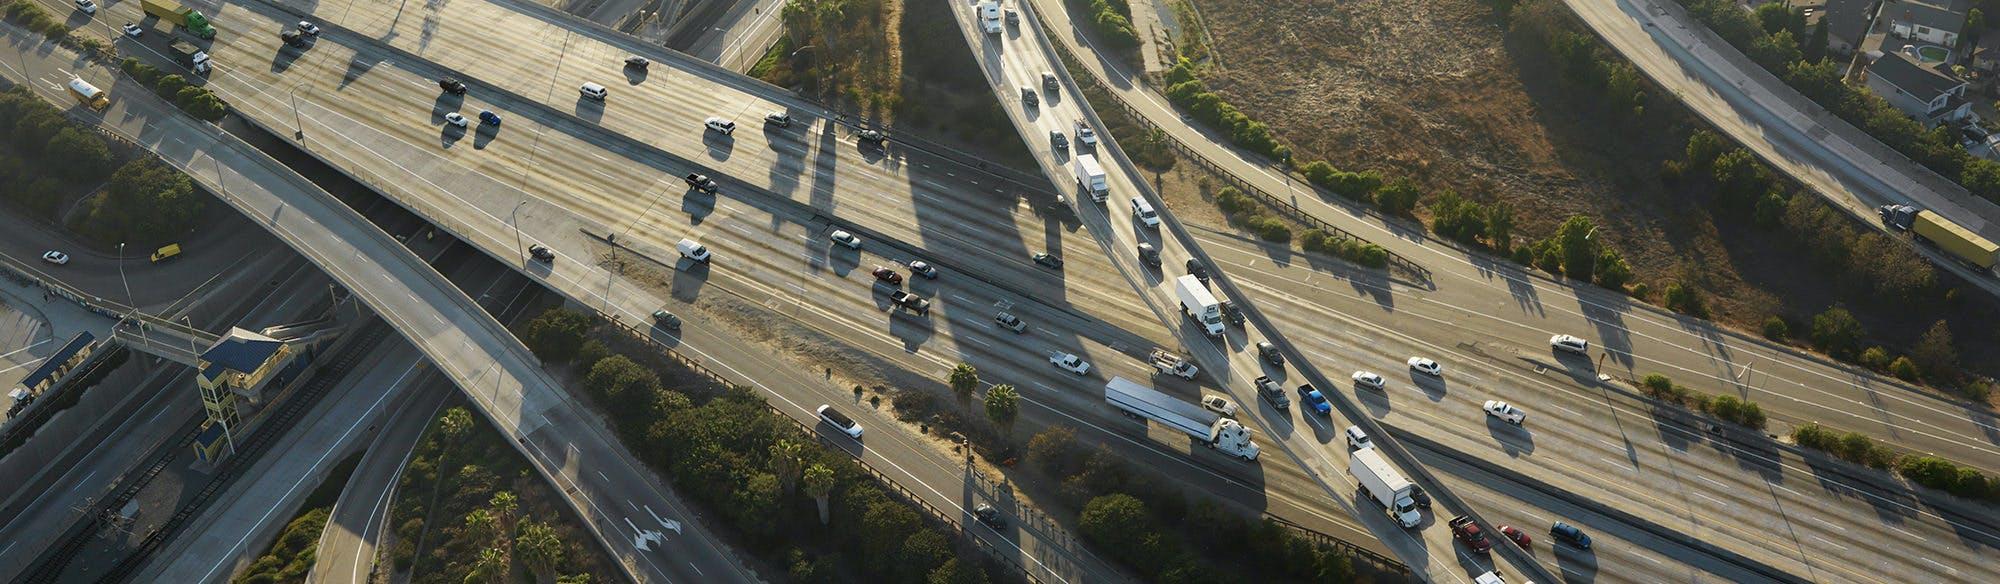 Stati Uniti: energia pulita dalle autostrade